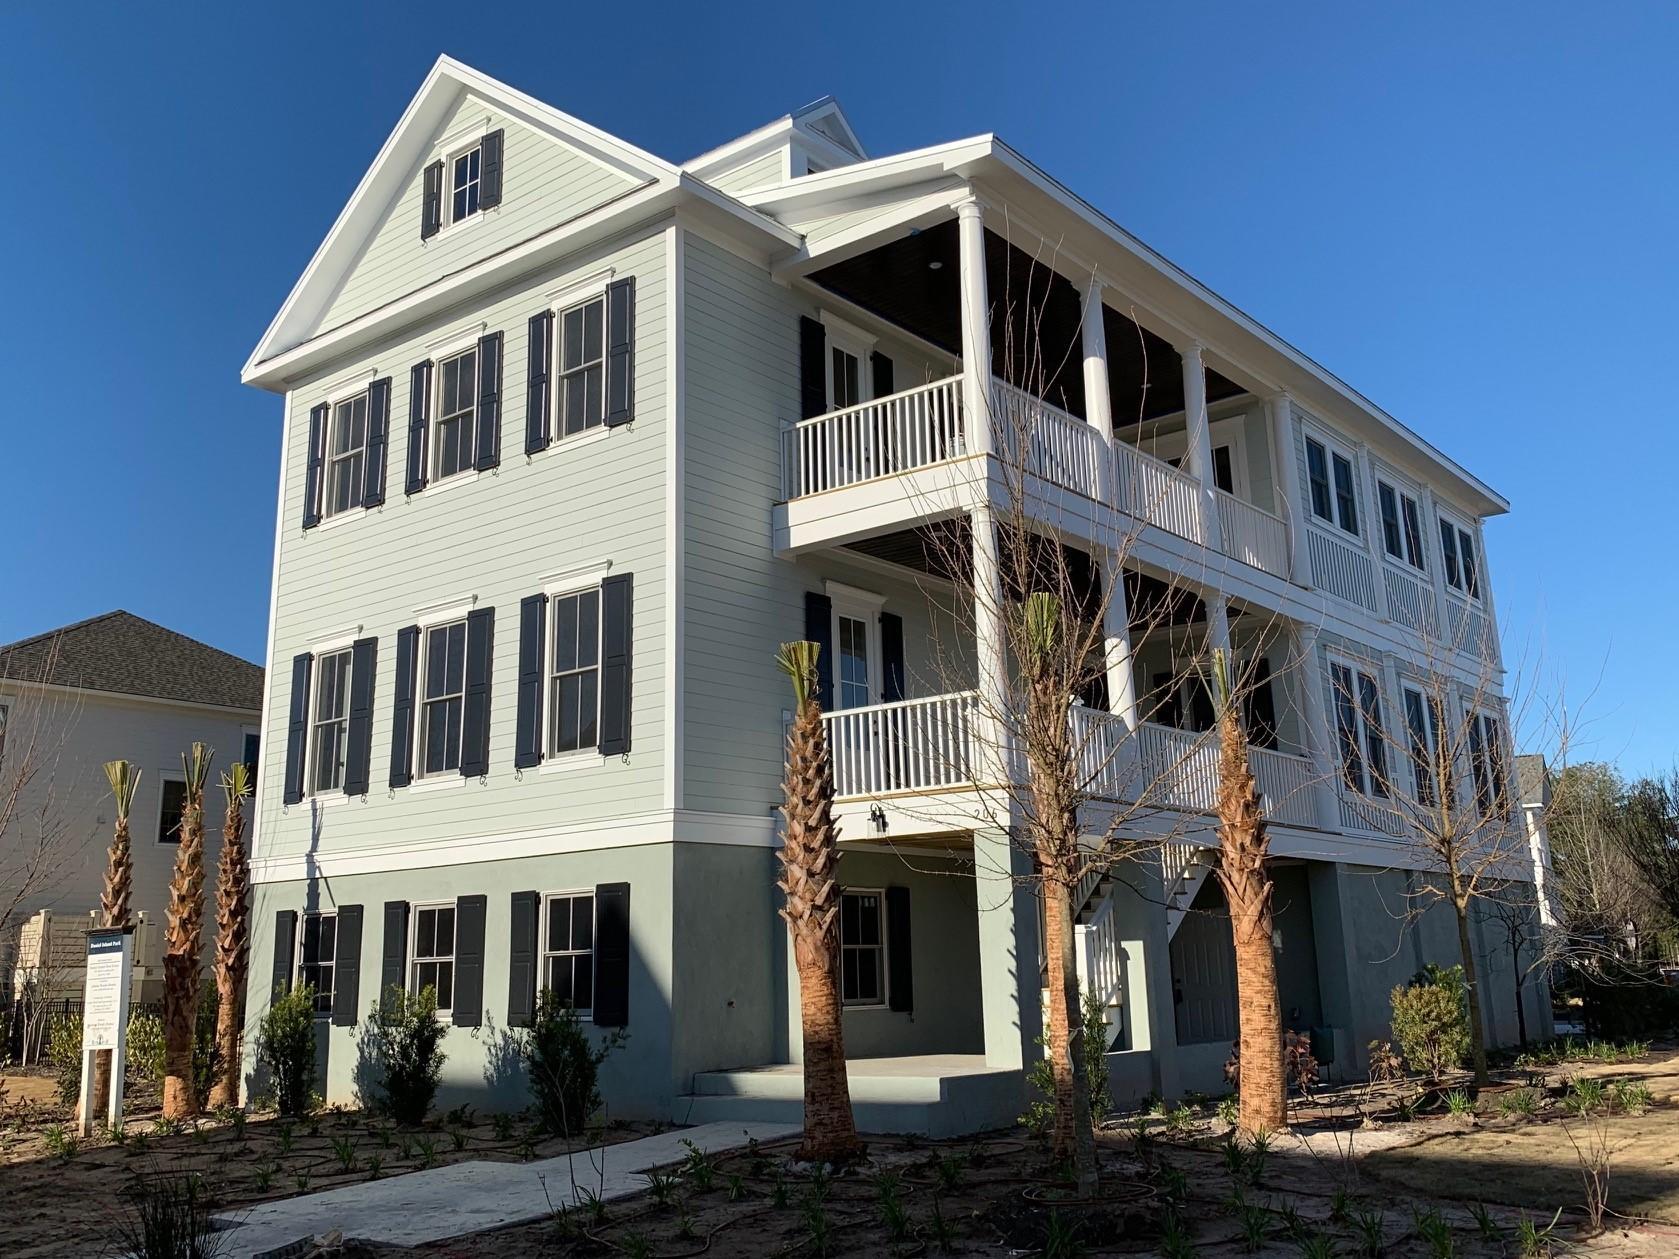 Daniel Island Homes For Sale - 206 Foundry, Charleston, SC - 23